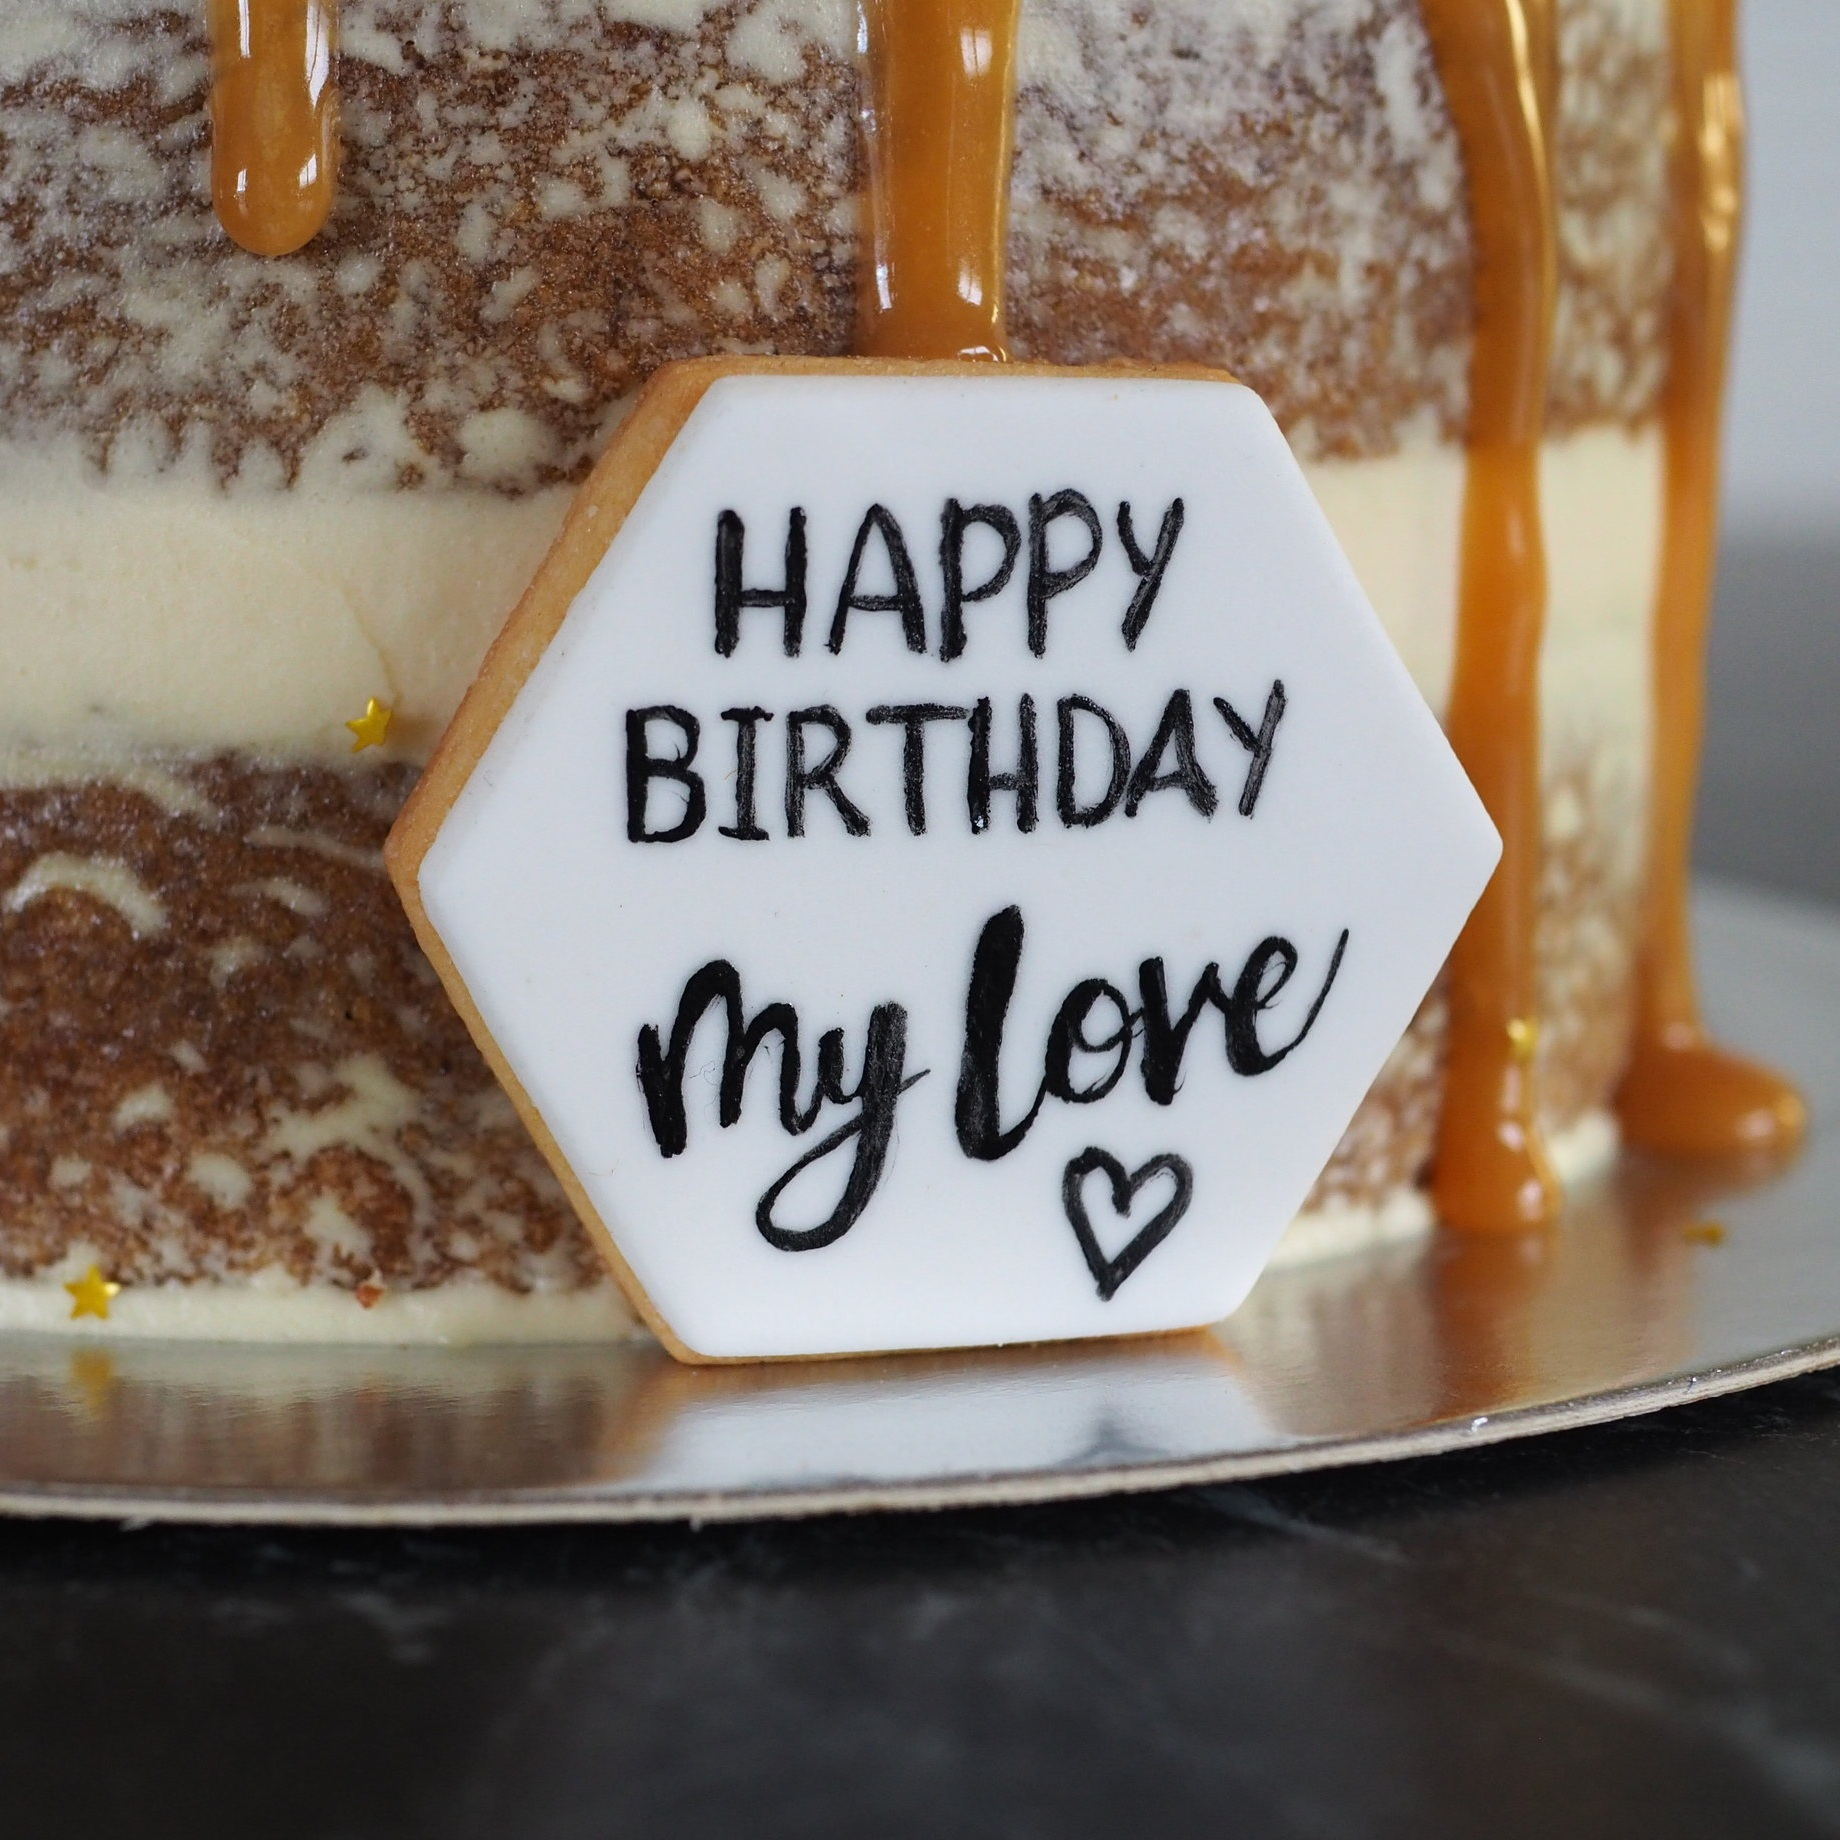 2019-03-21 Salted caramel drip cake 009.JPG